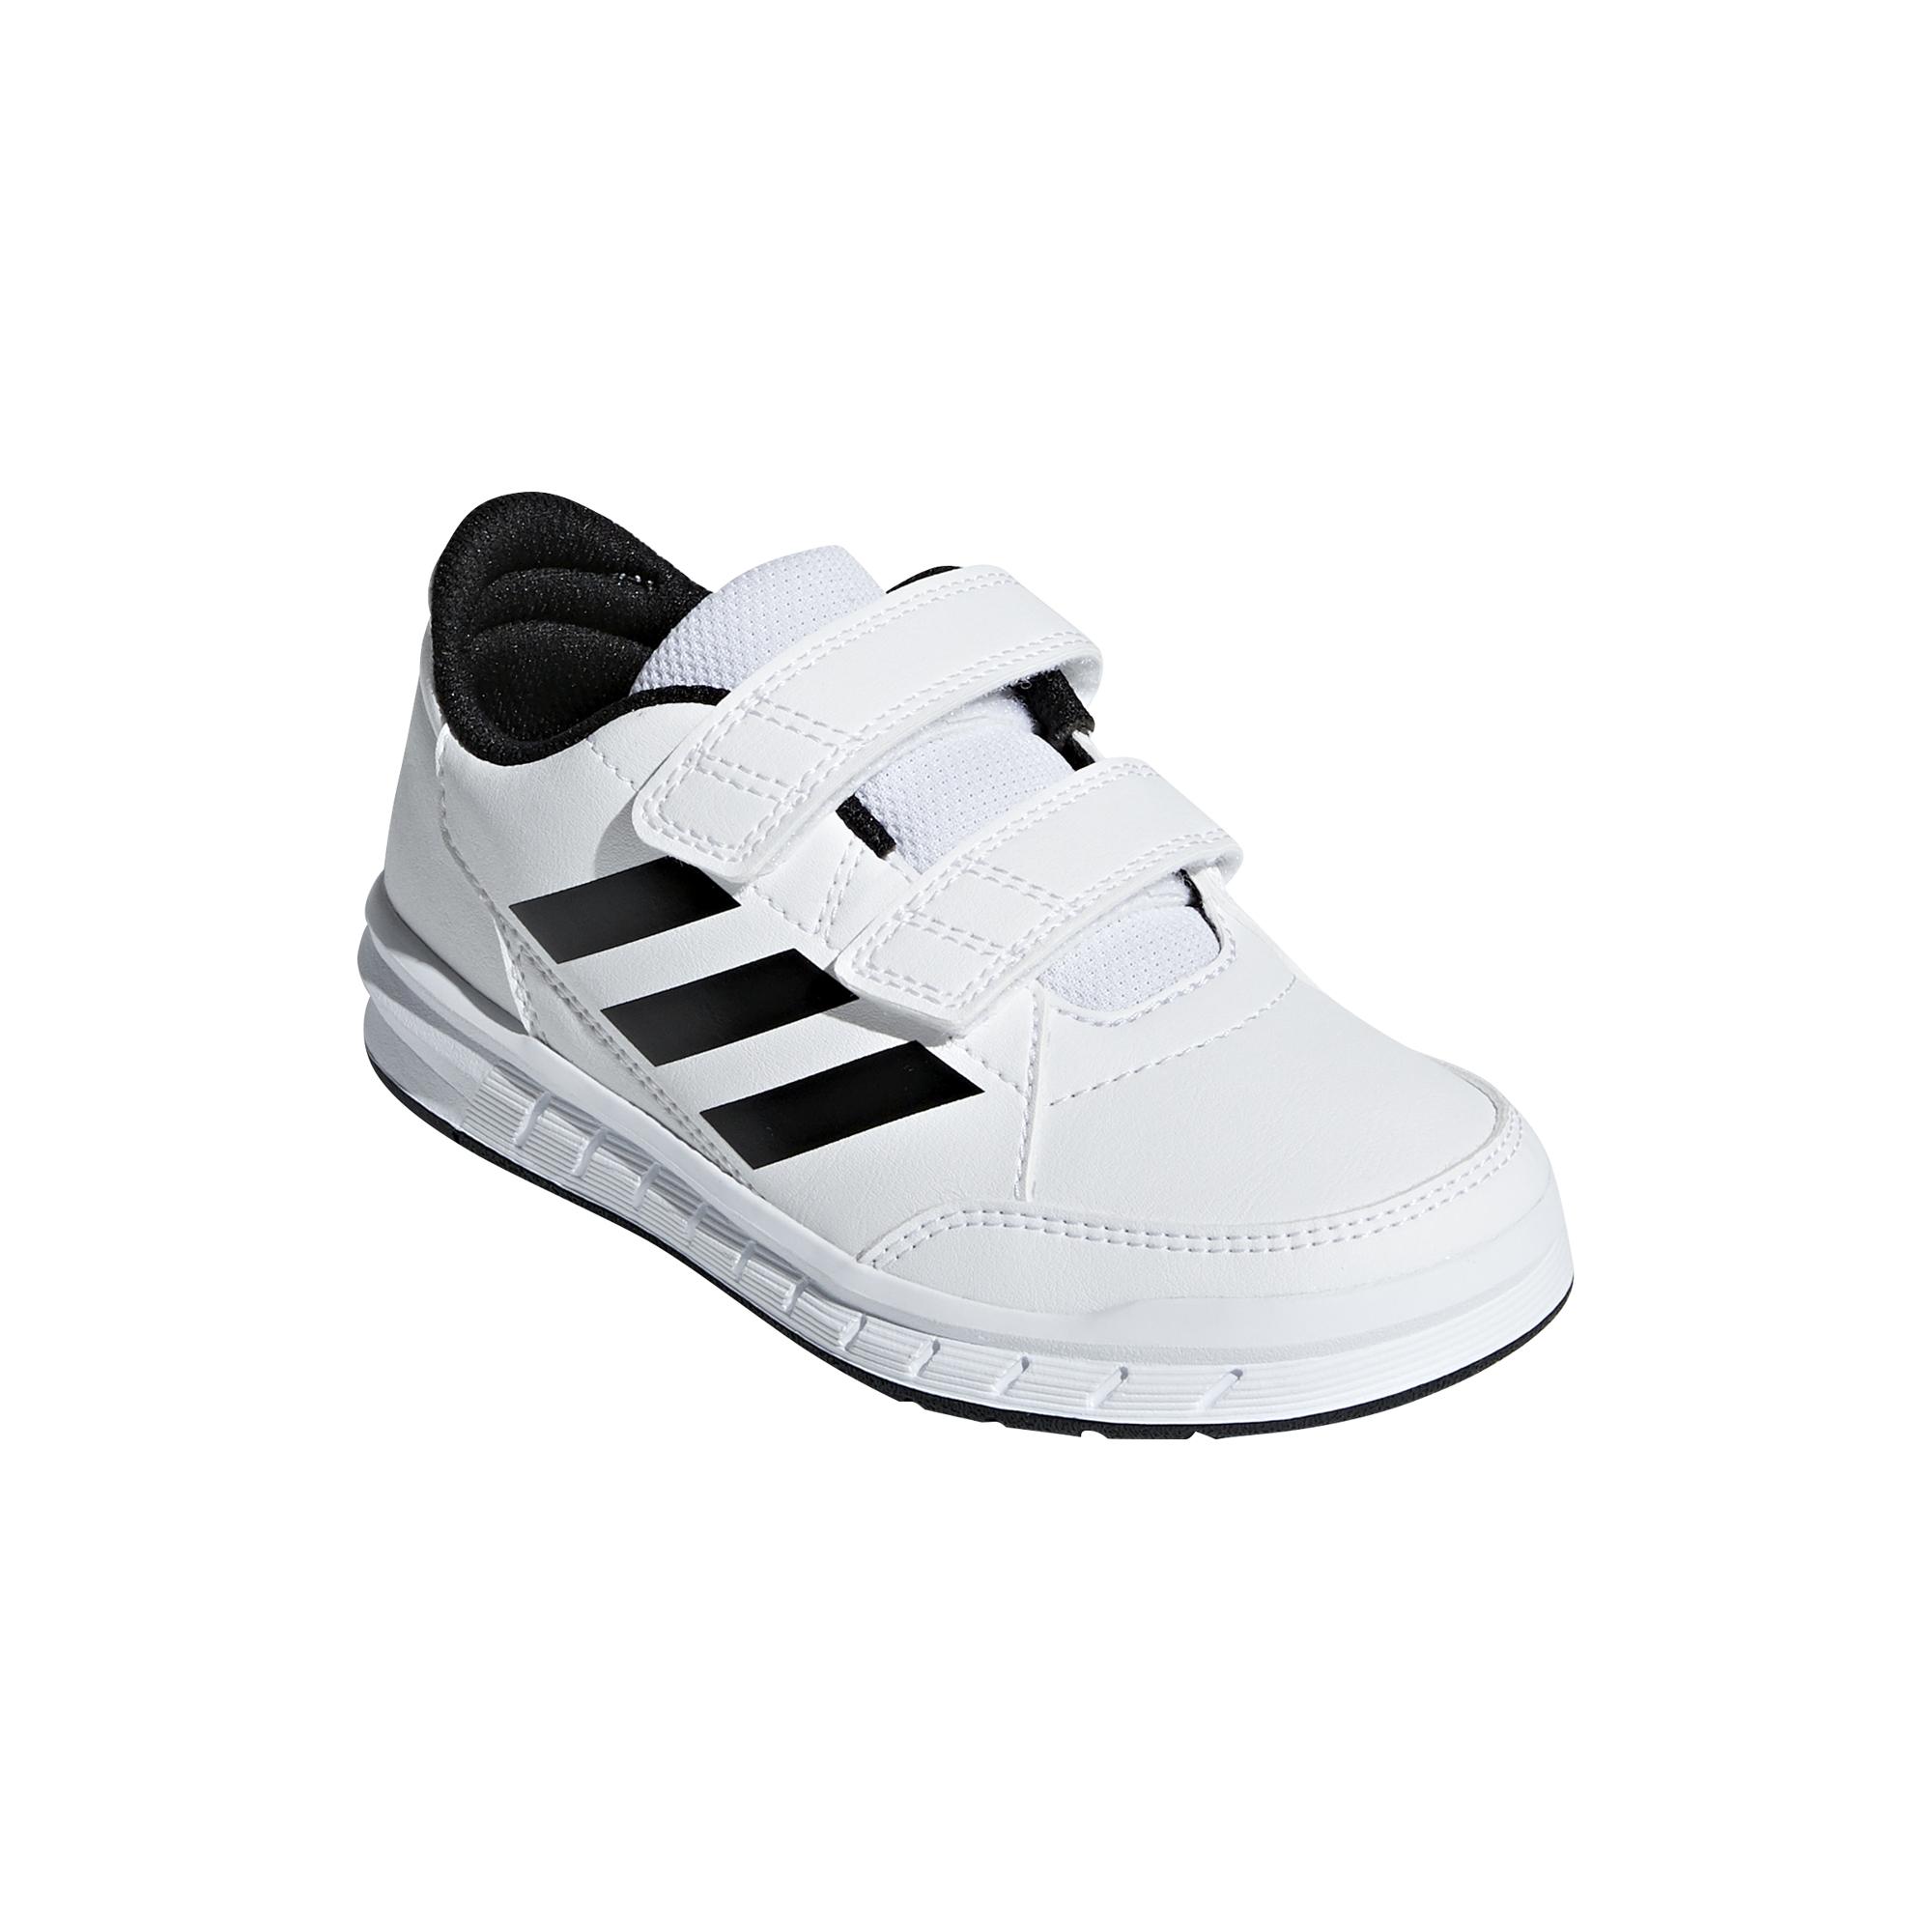 pretty nice 19d14 24d78 Chaussures kid adidas AltaSport